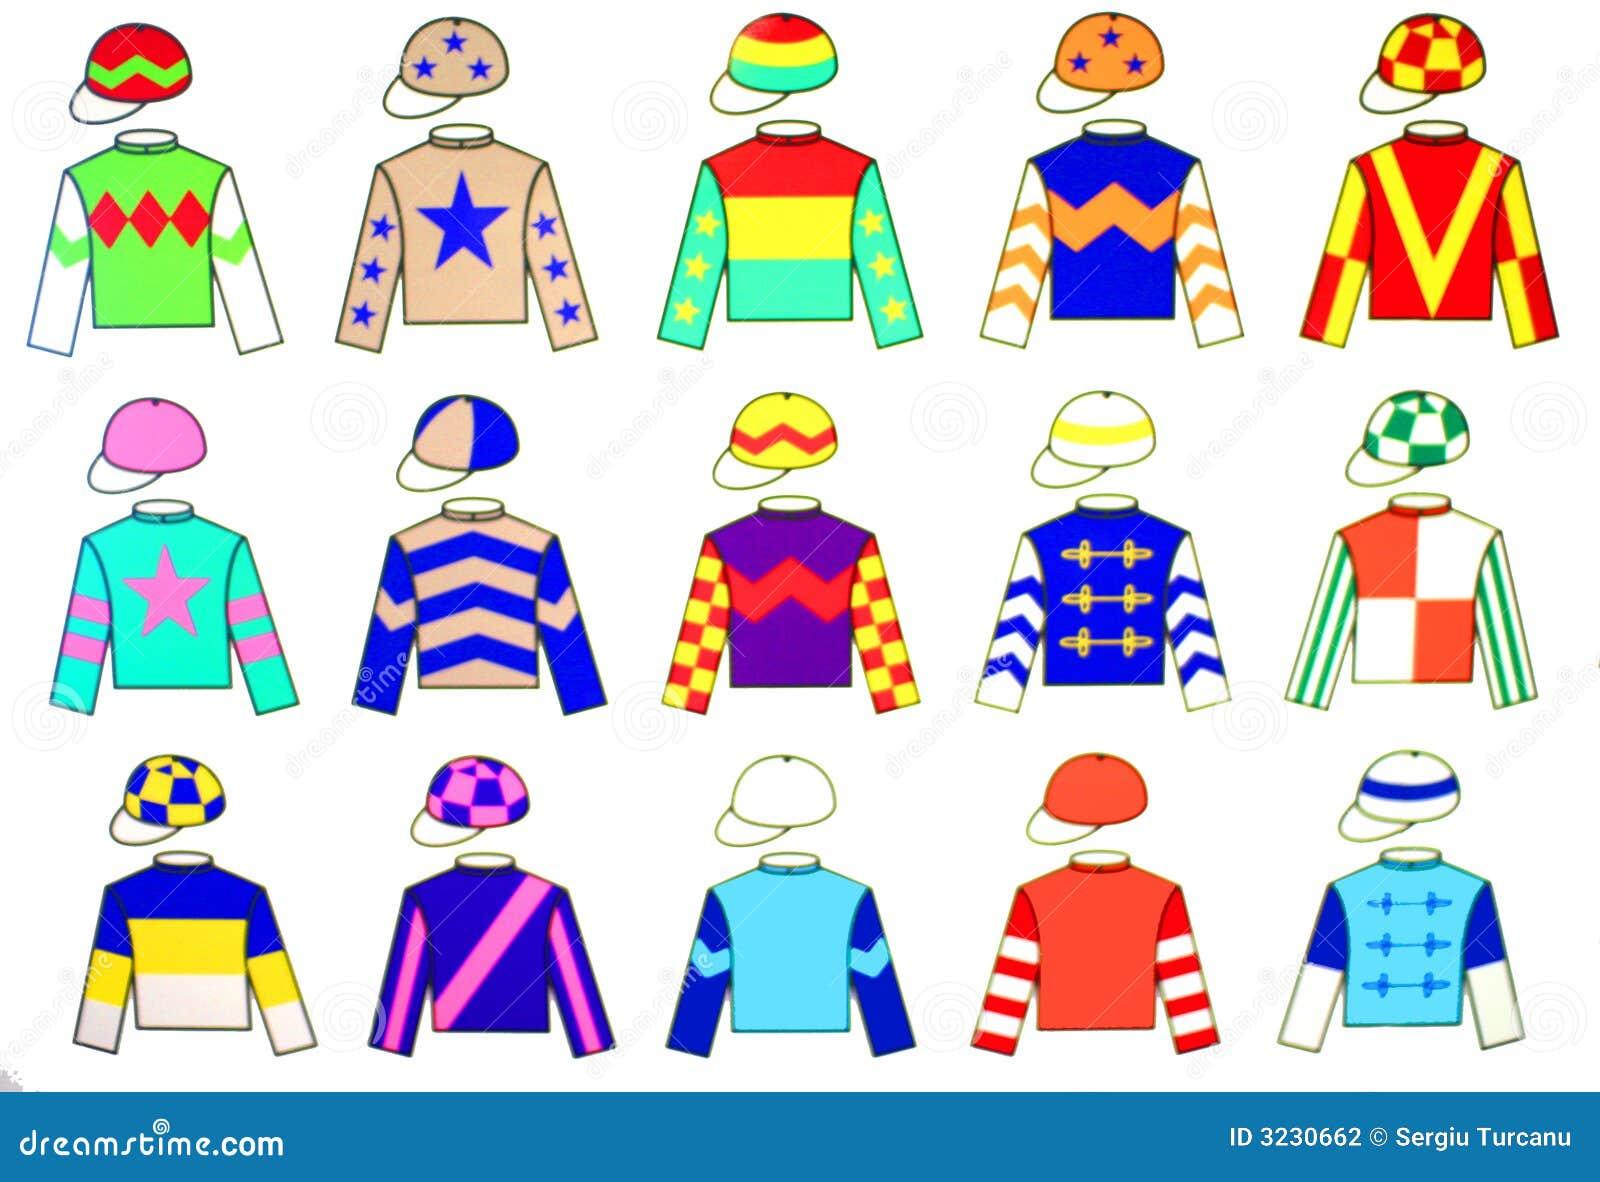 Jockey Silks Design